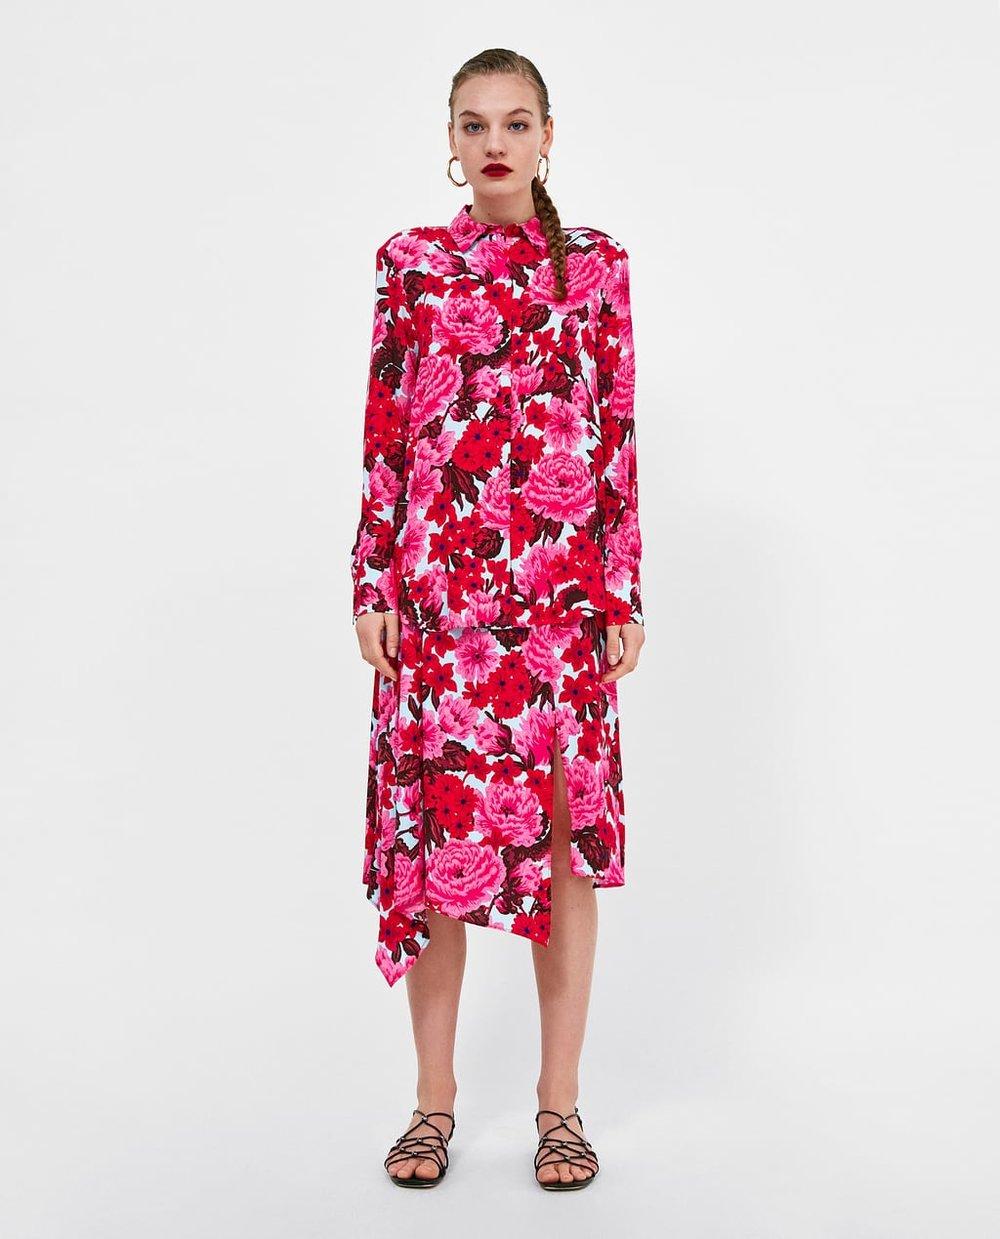 Floral Top+Skirt